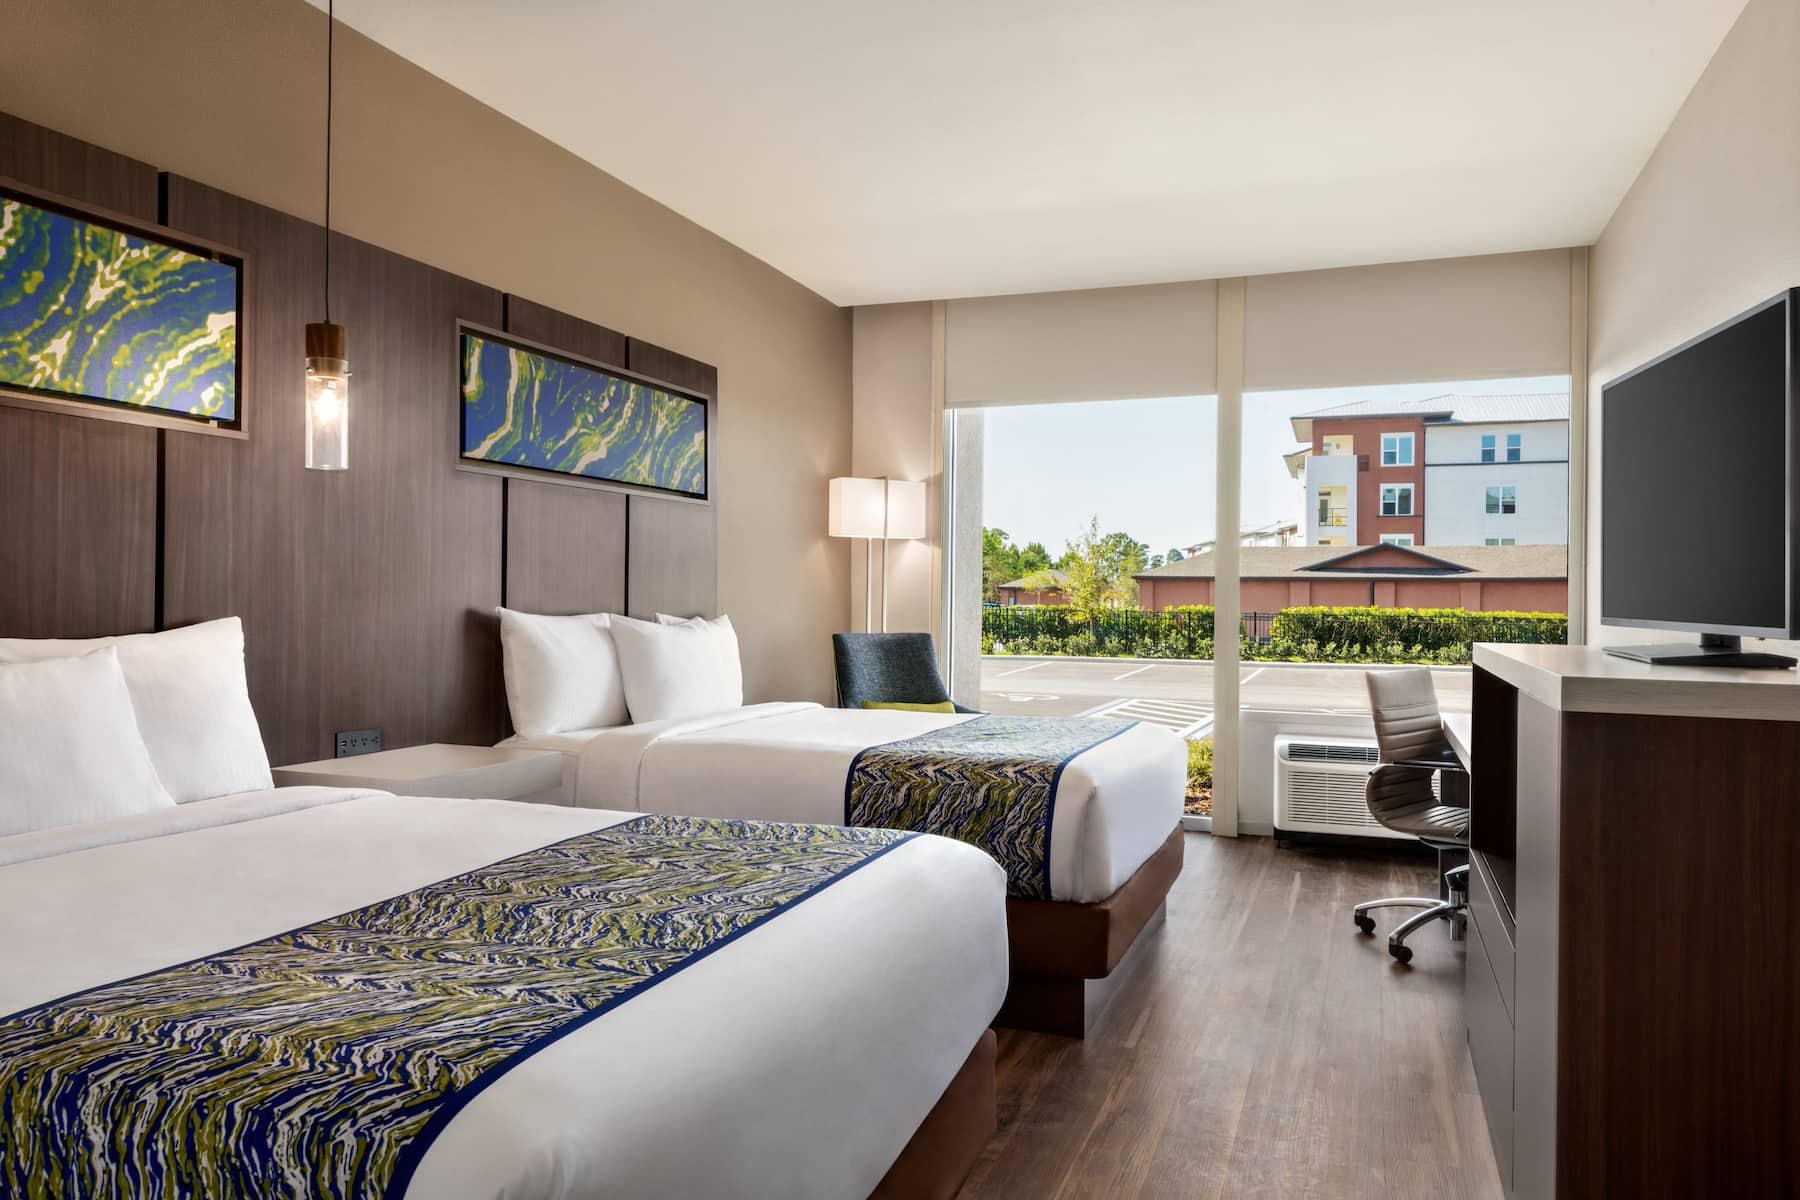 La Quinta Inn Amp Suites By Wyndham Orlando Idrive Theme